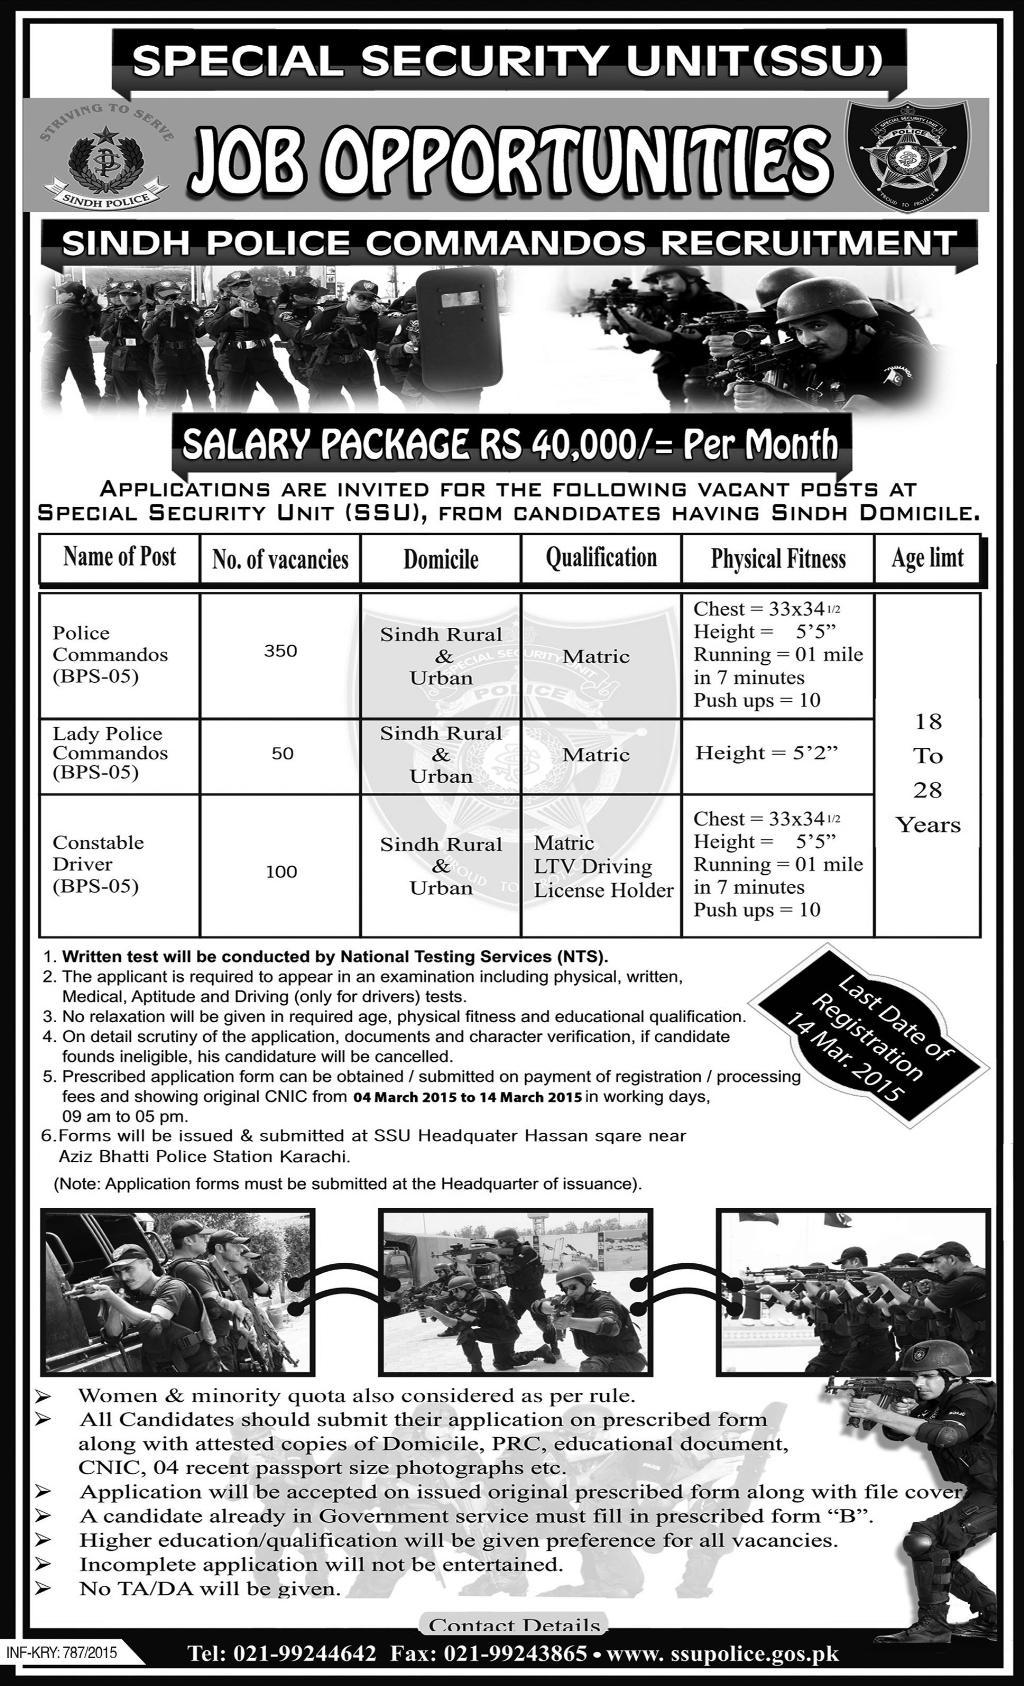 Sindh Police Commando SSU Jobs 2015 Male, Female